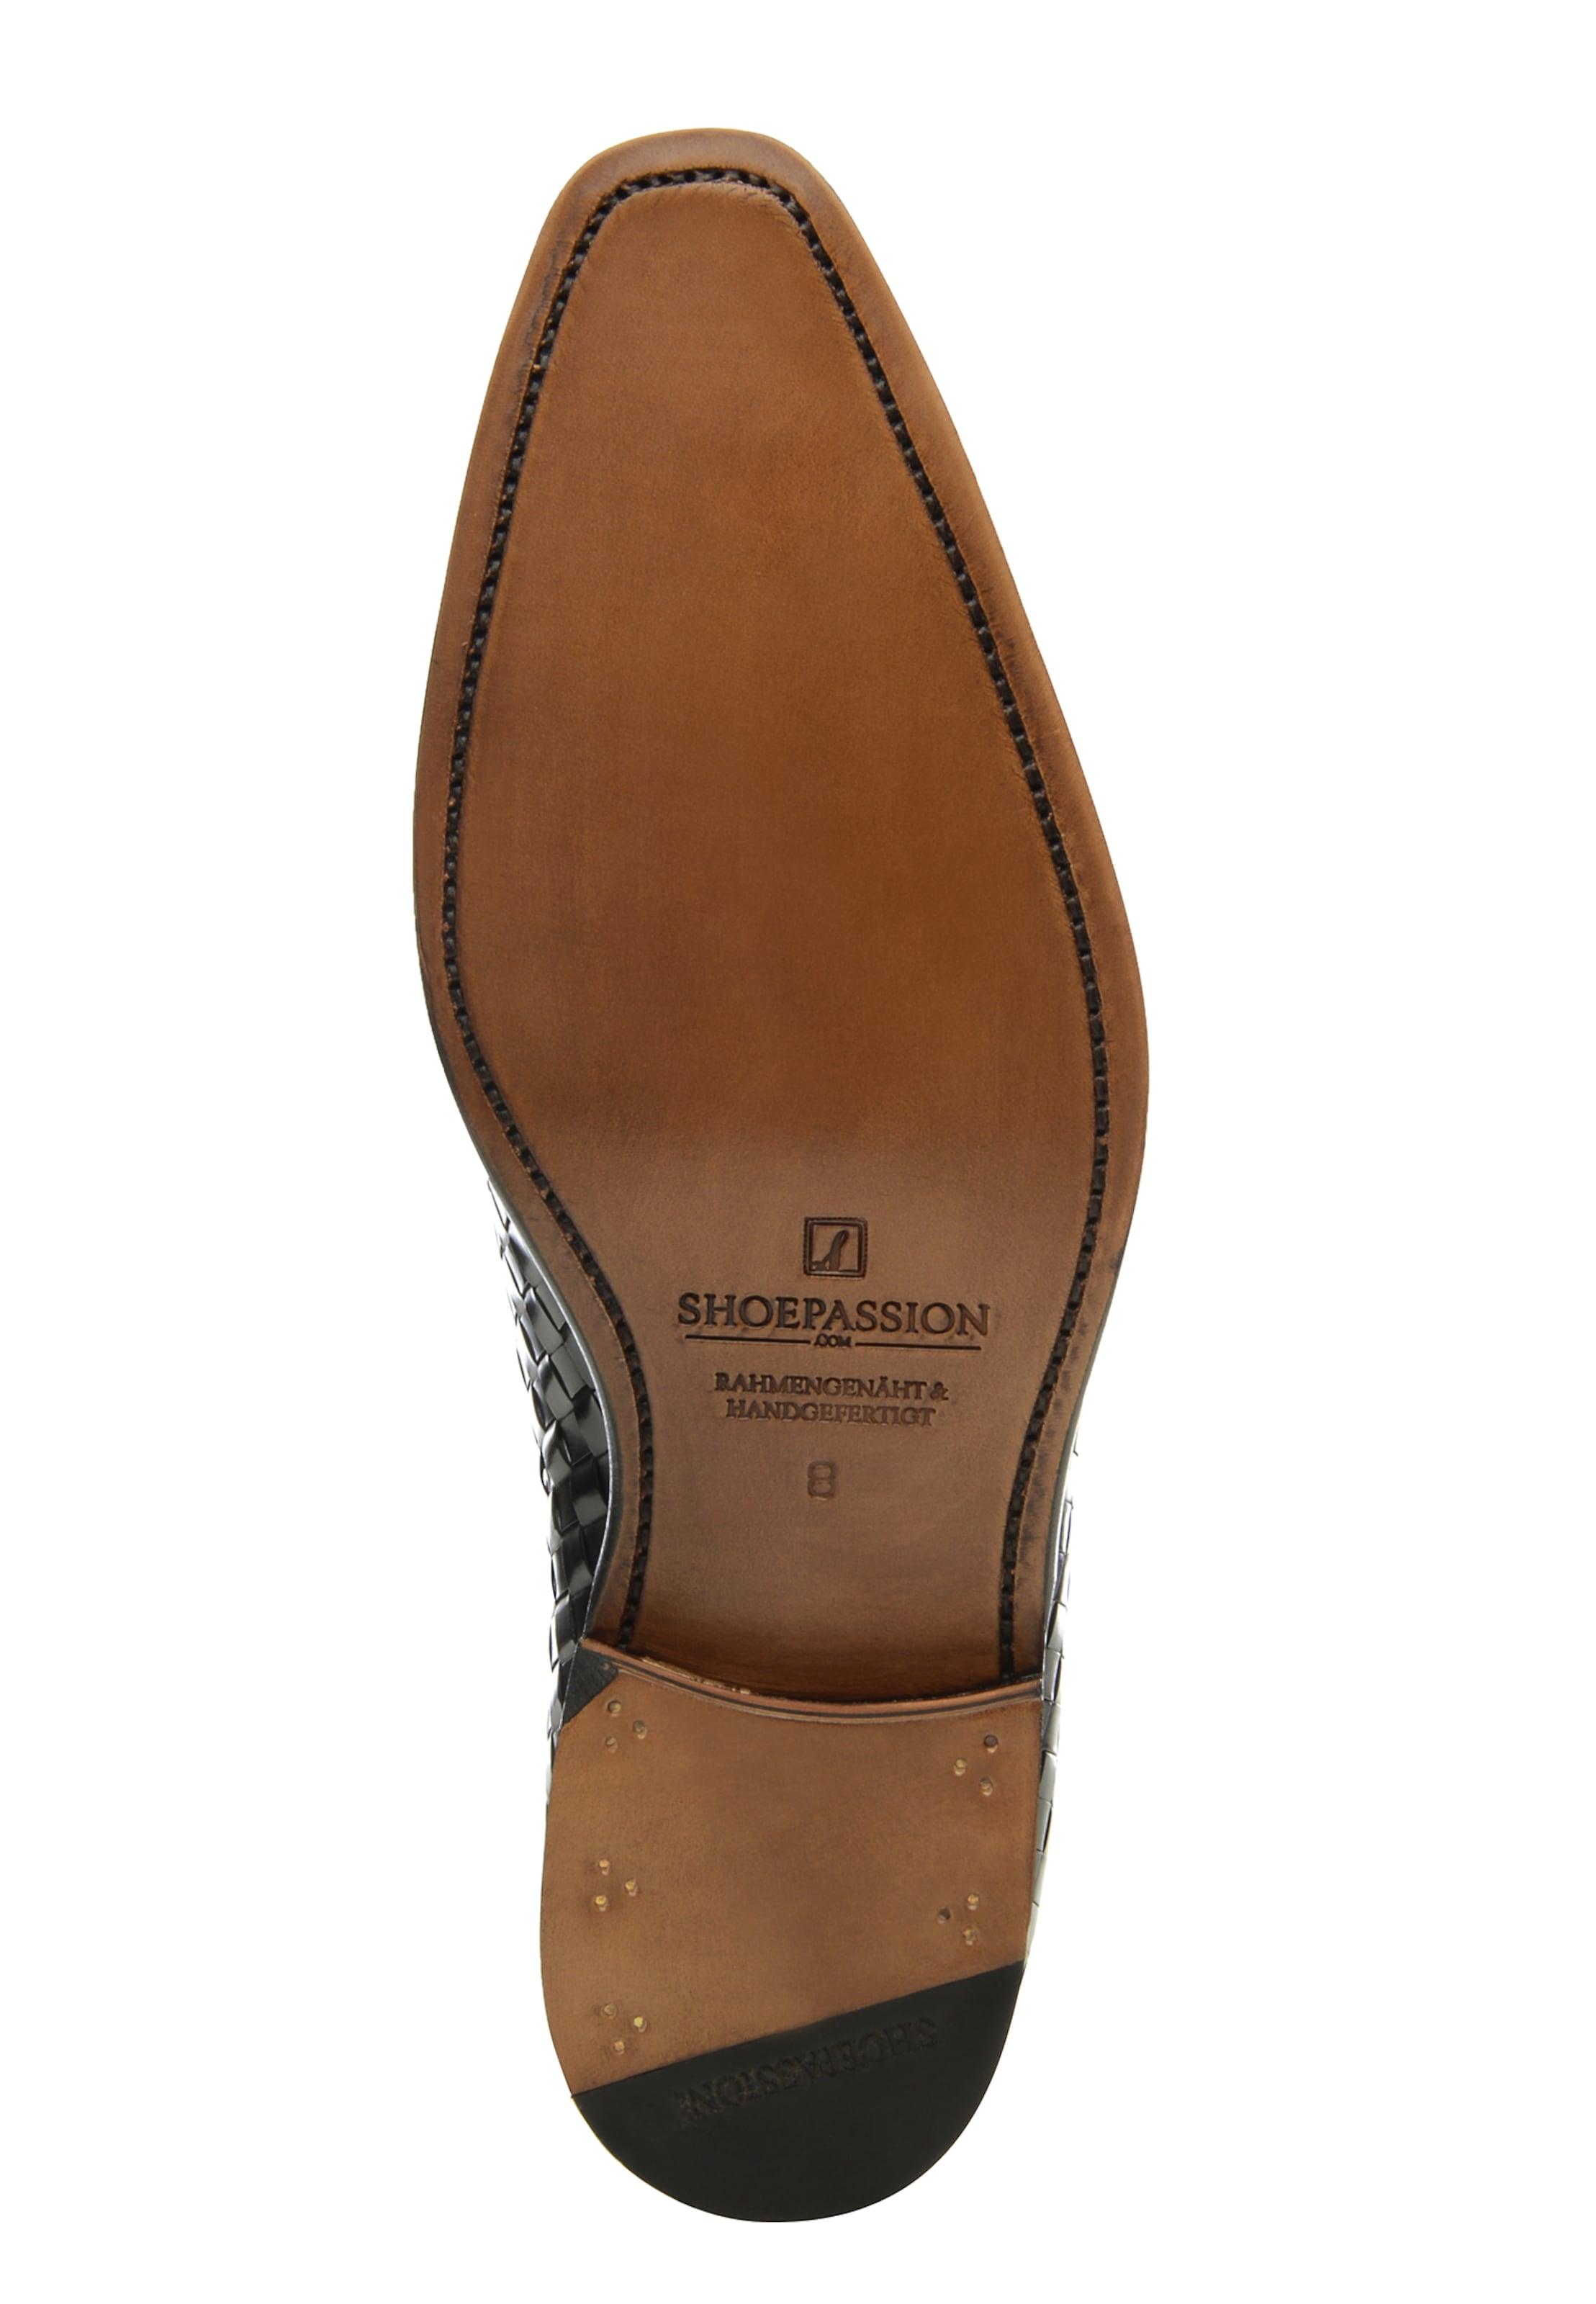 Halbschuhe 'no360' Schwarz 'no360' Shoepassion Halbschuhe In Schwarz Shoepassion In Shoepassion clFK1JT3